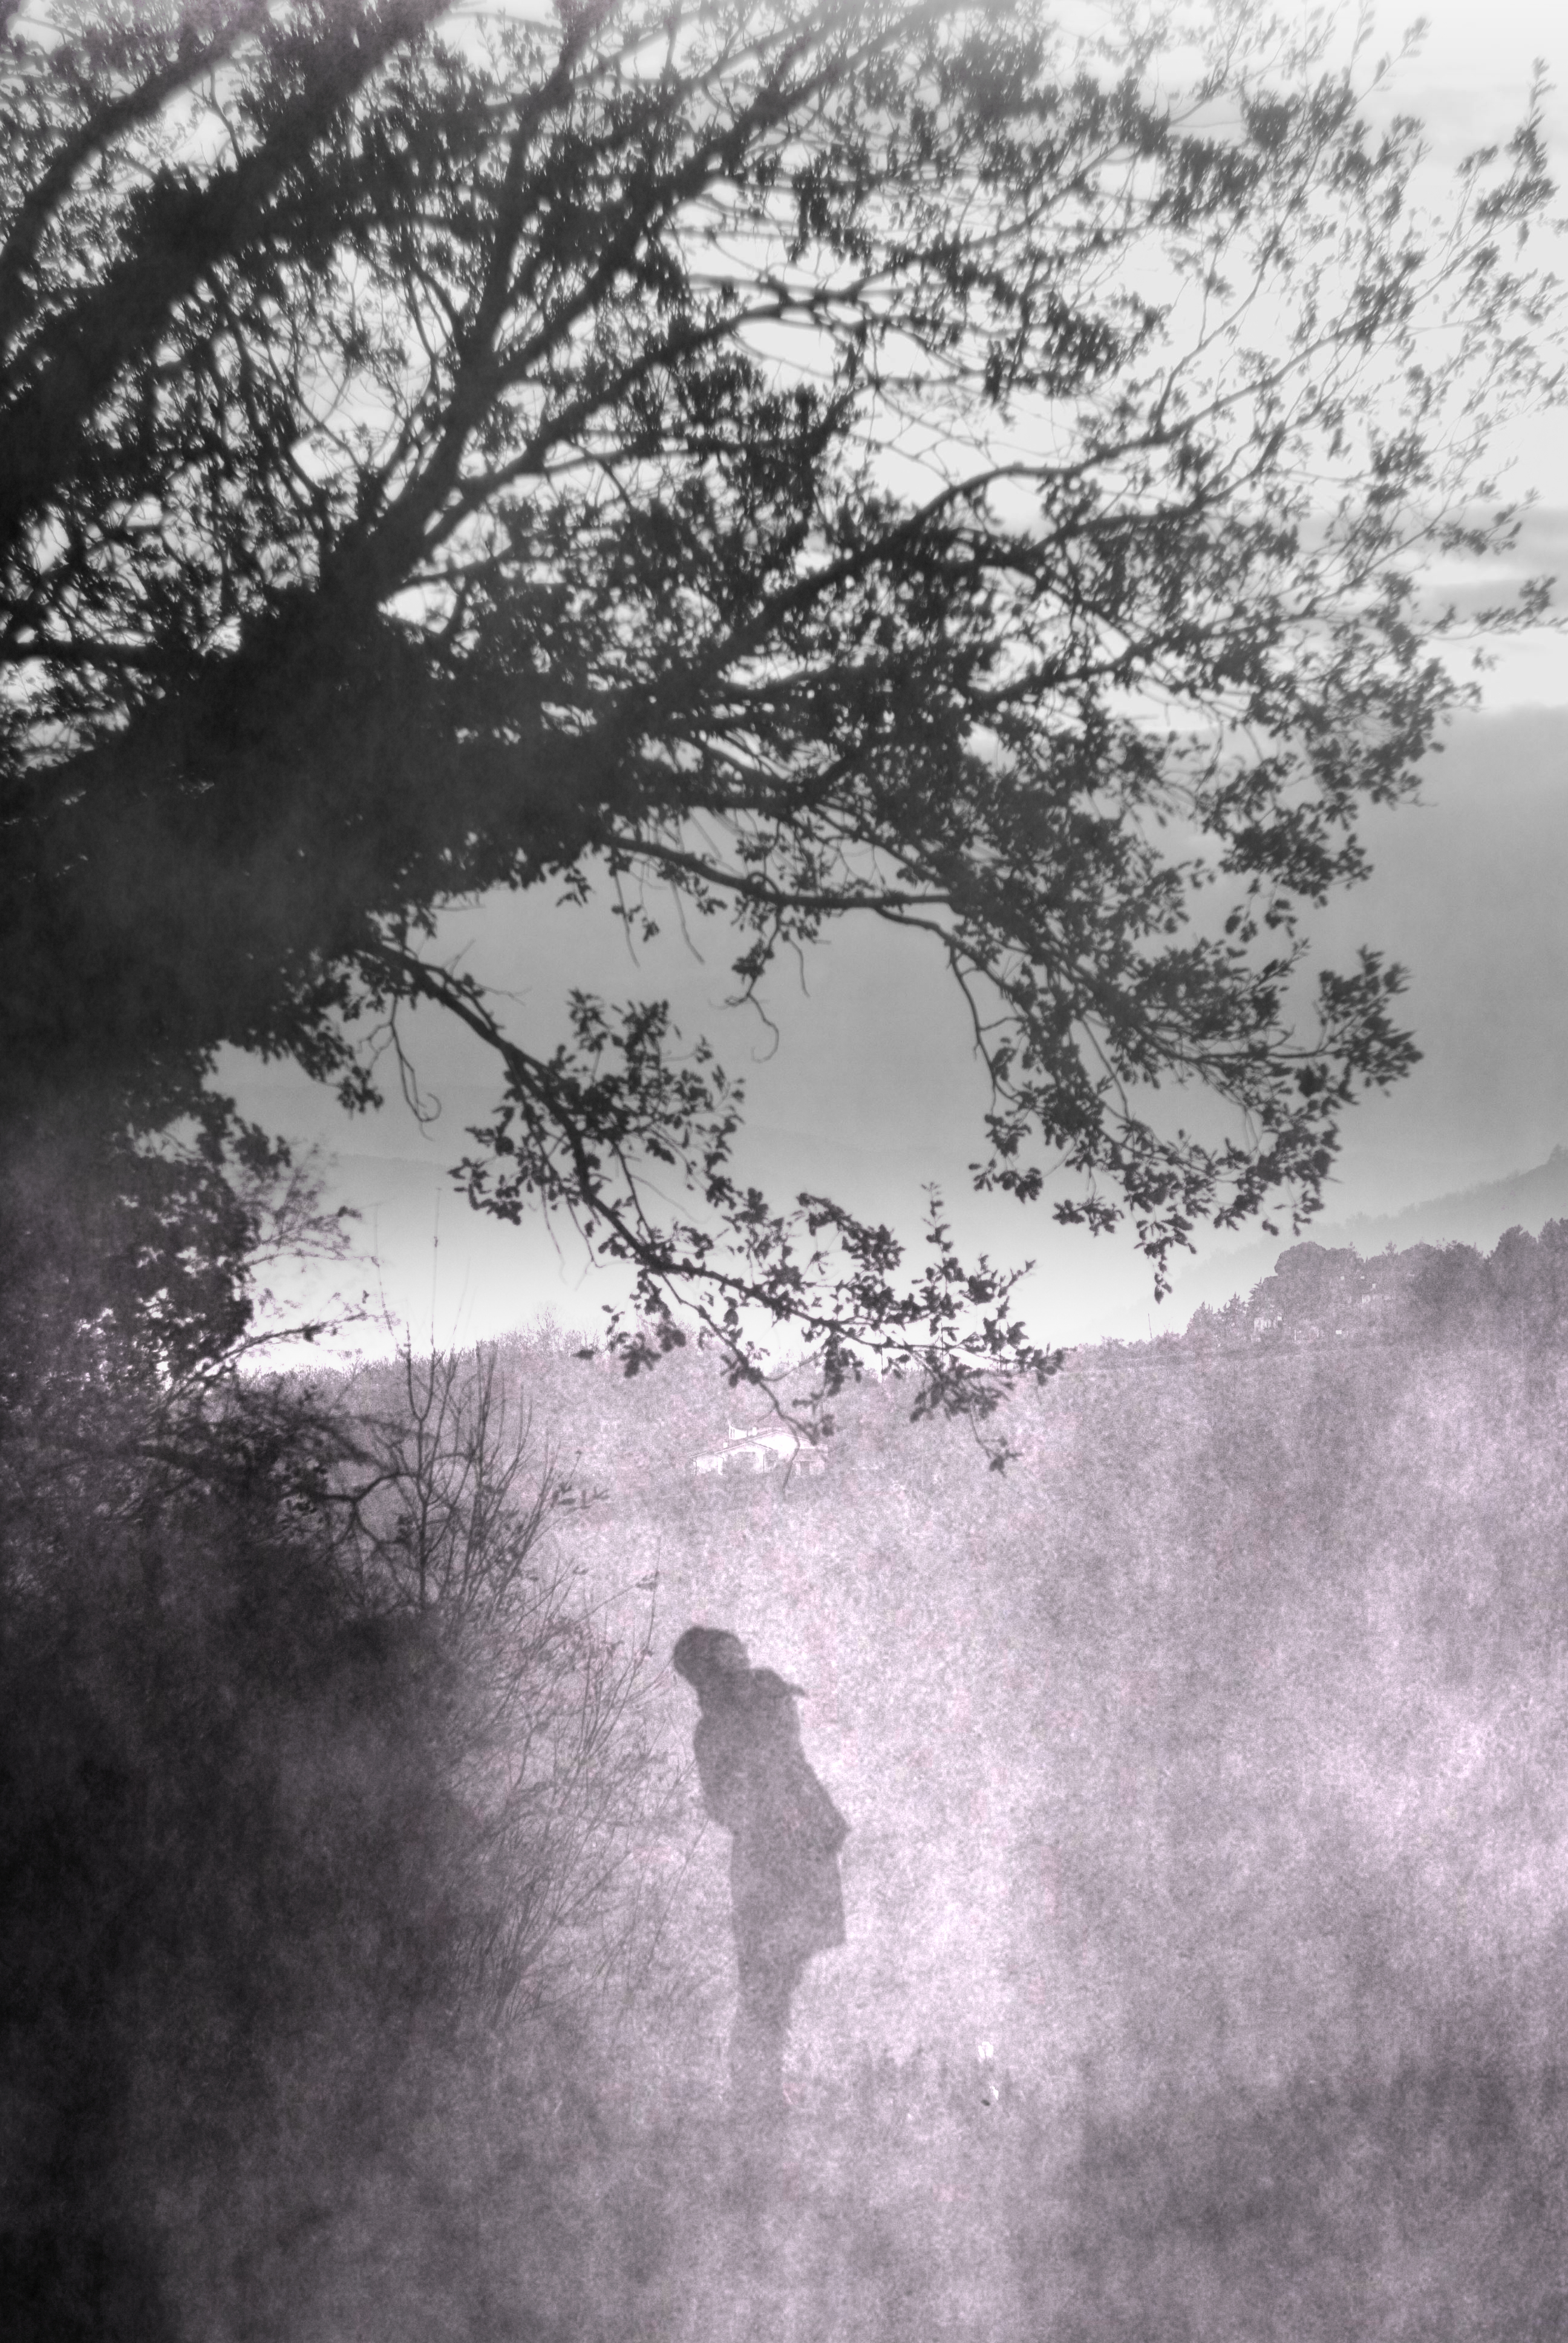 chiara_boschi_foggy_tree